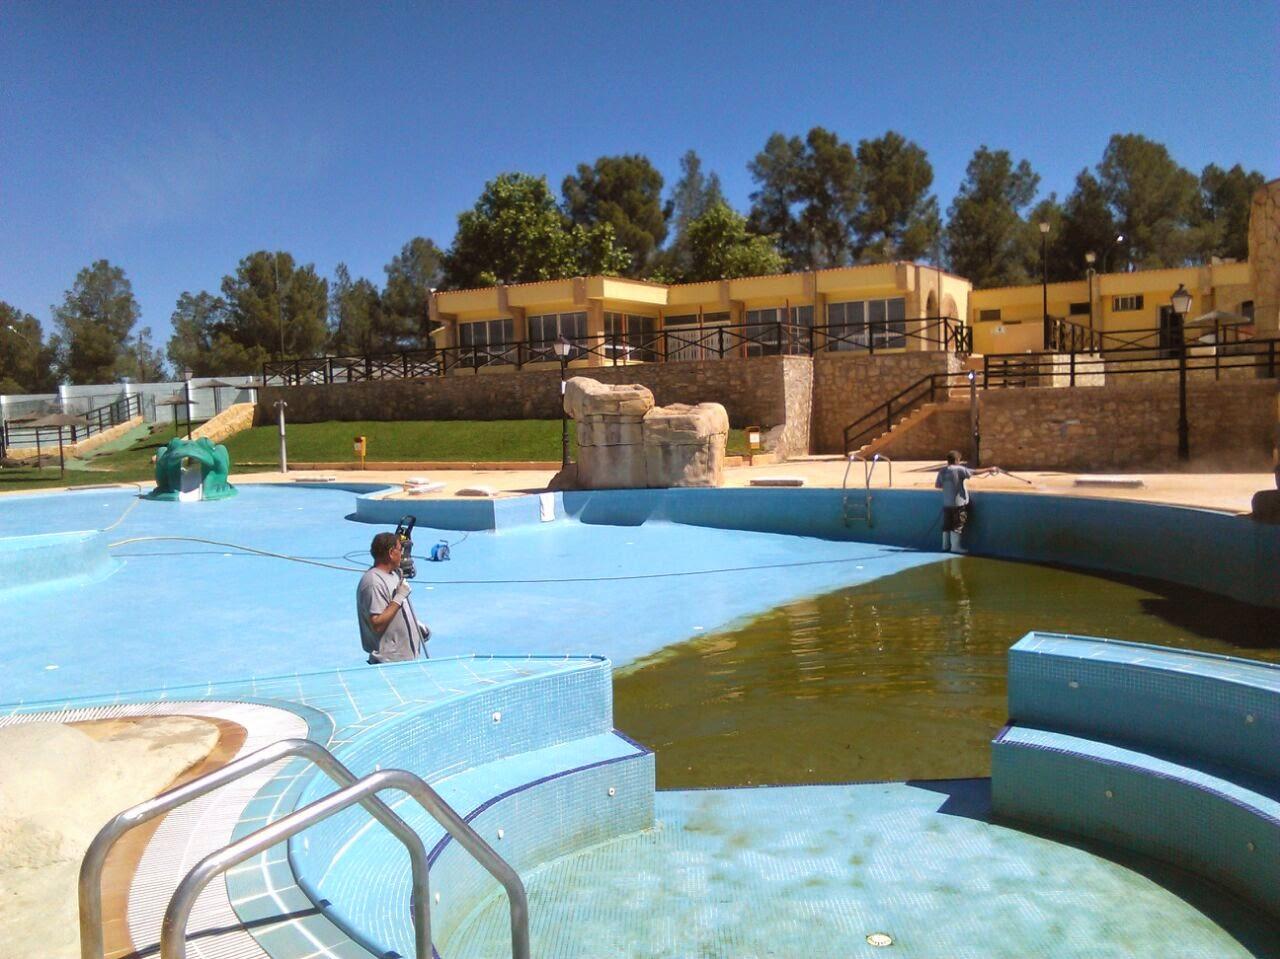 El informal segorbino segorbe pone a punto sus piscinas for Piscina segorbe